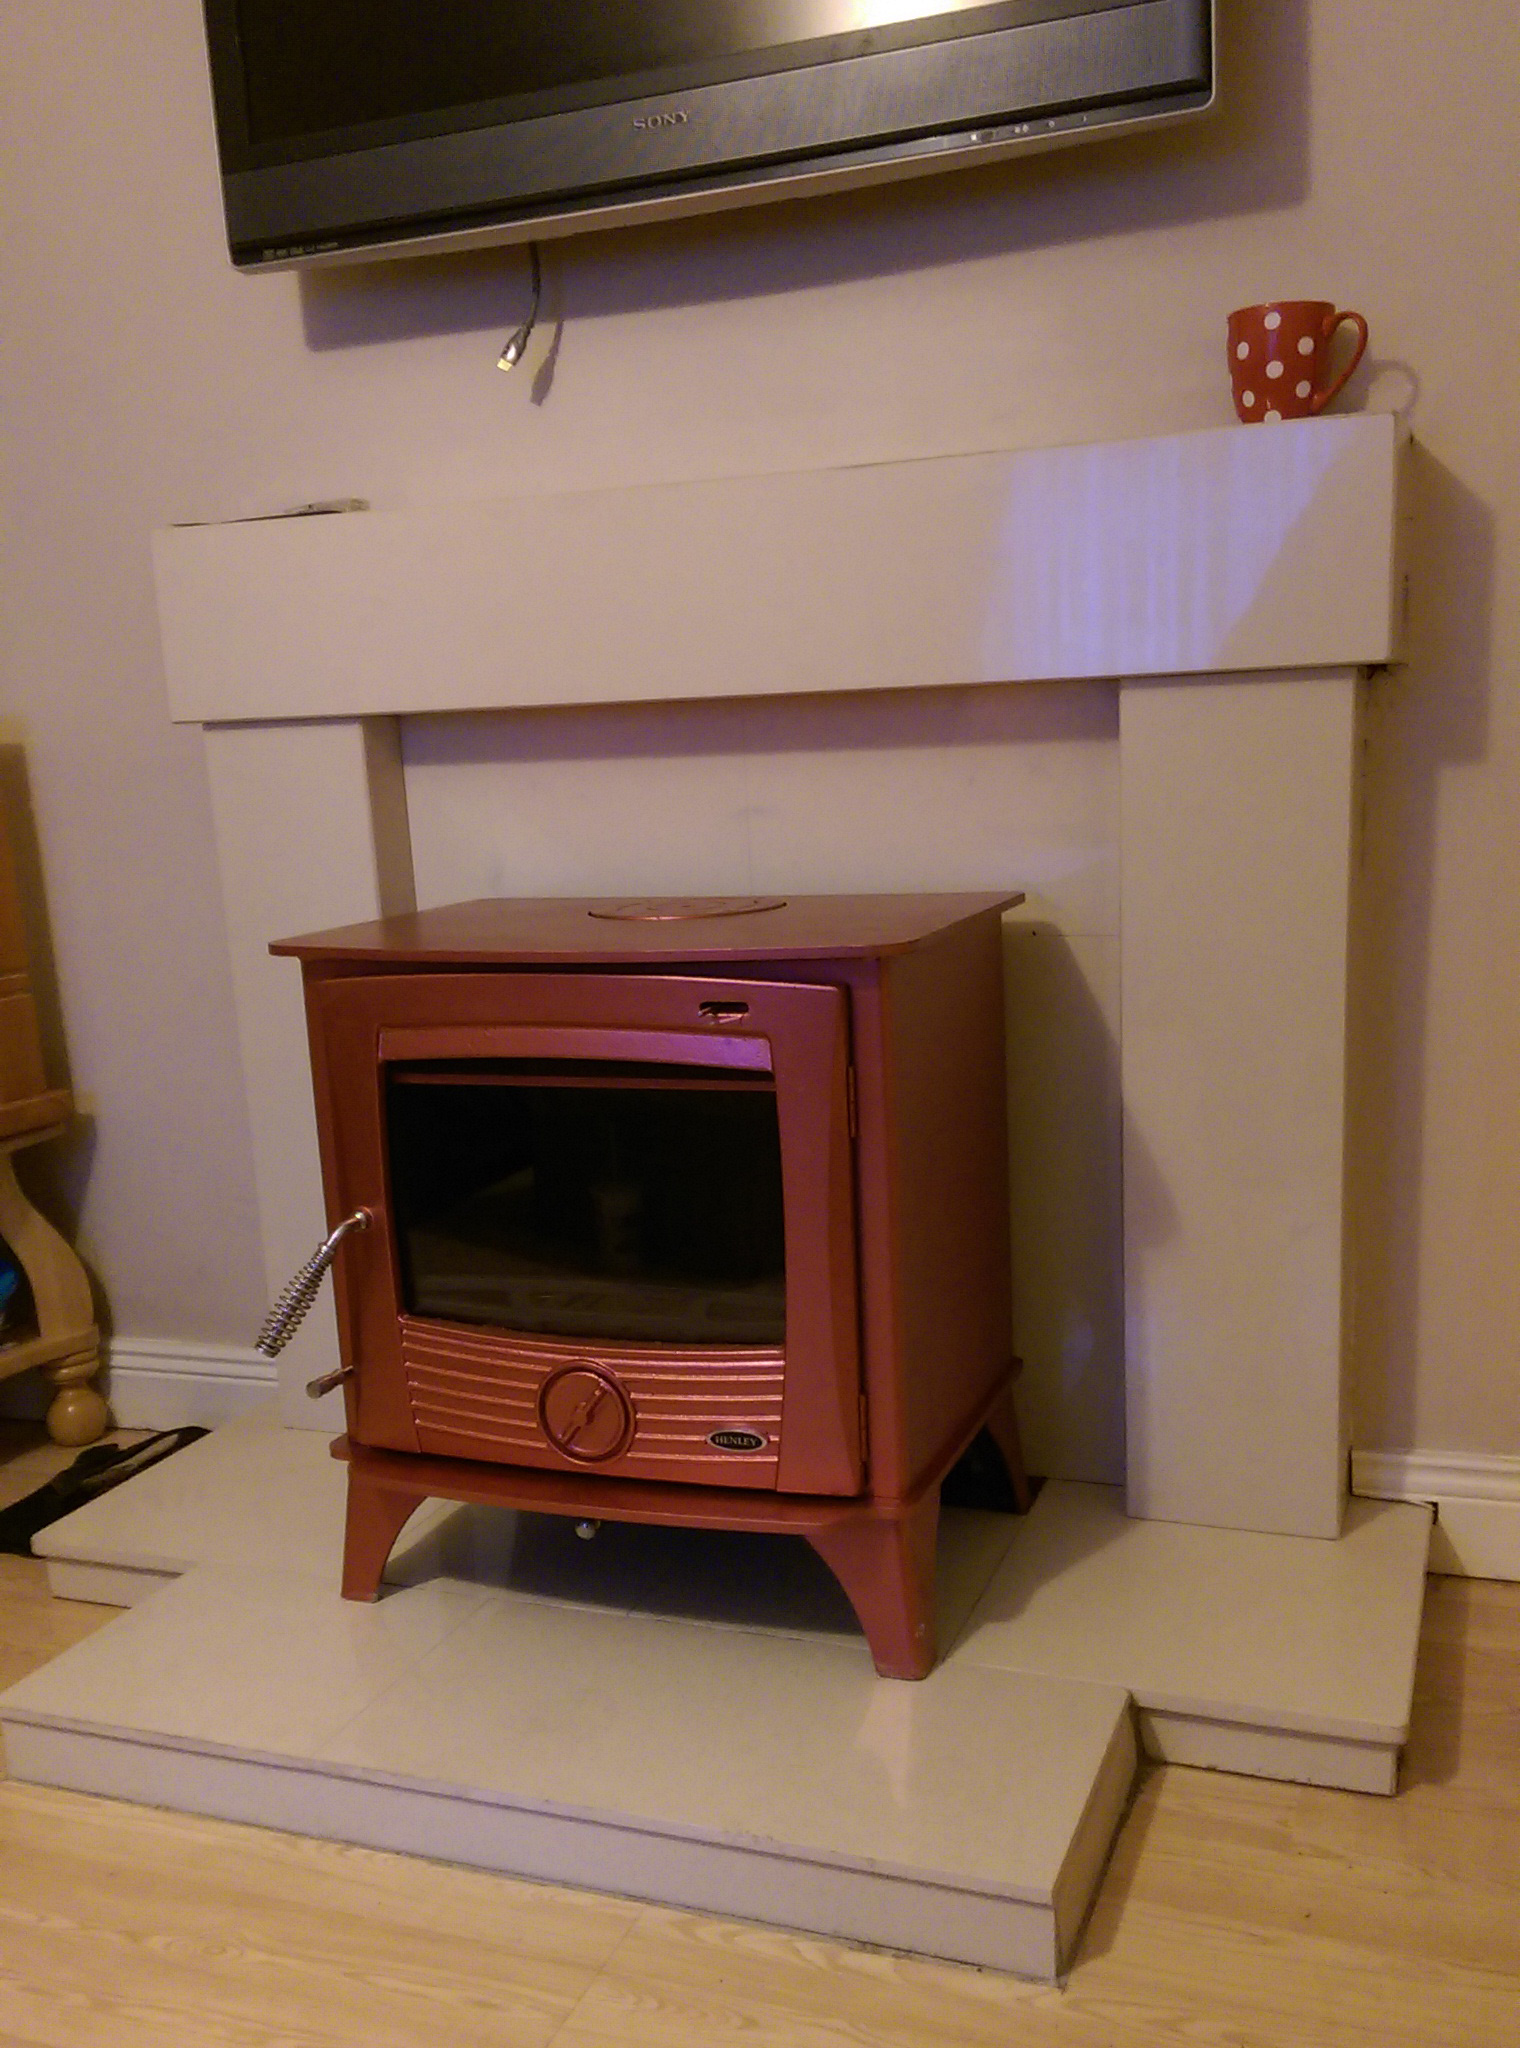 Red Druid 12kw boiler image